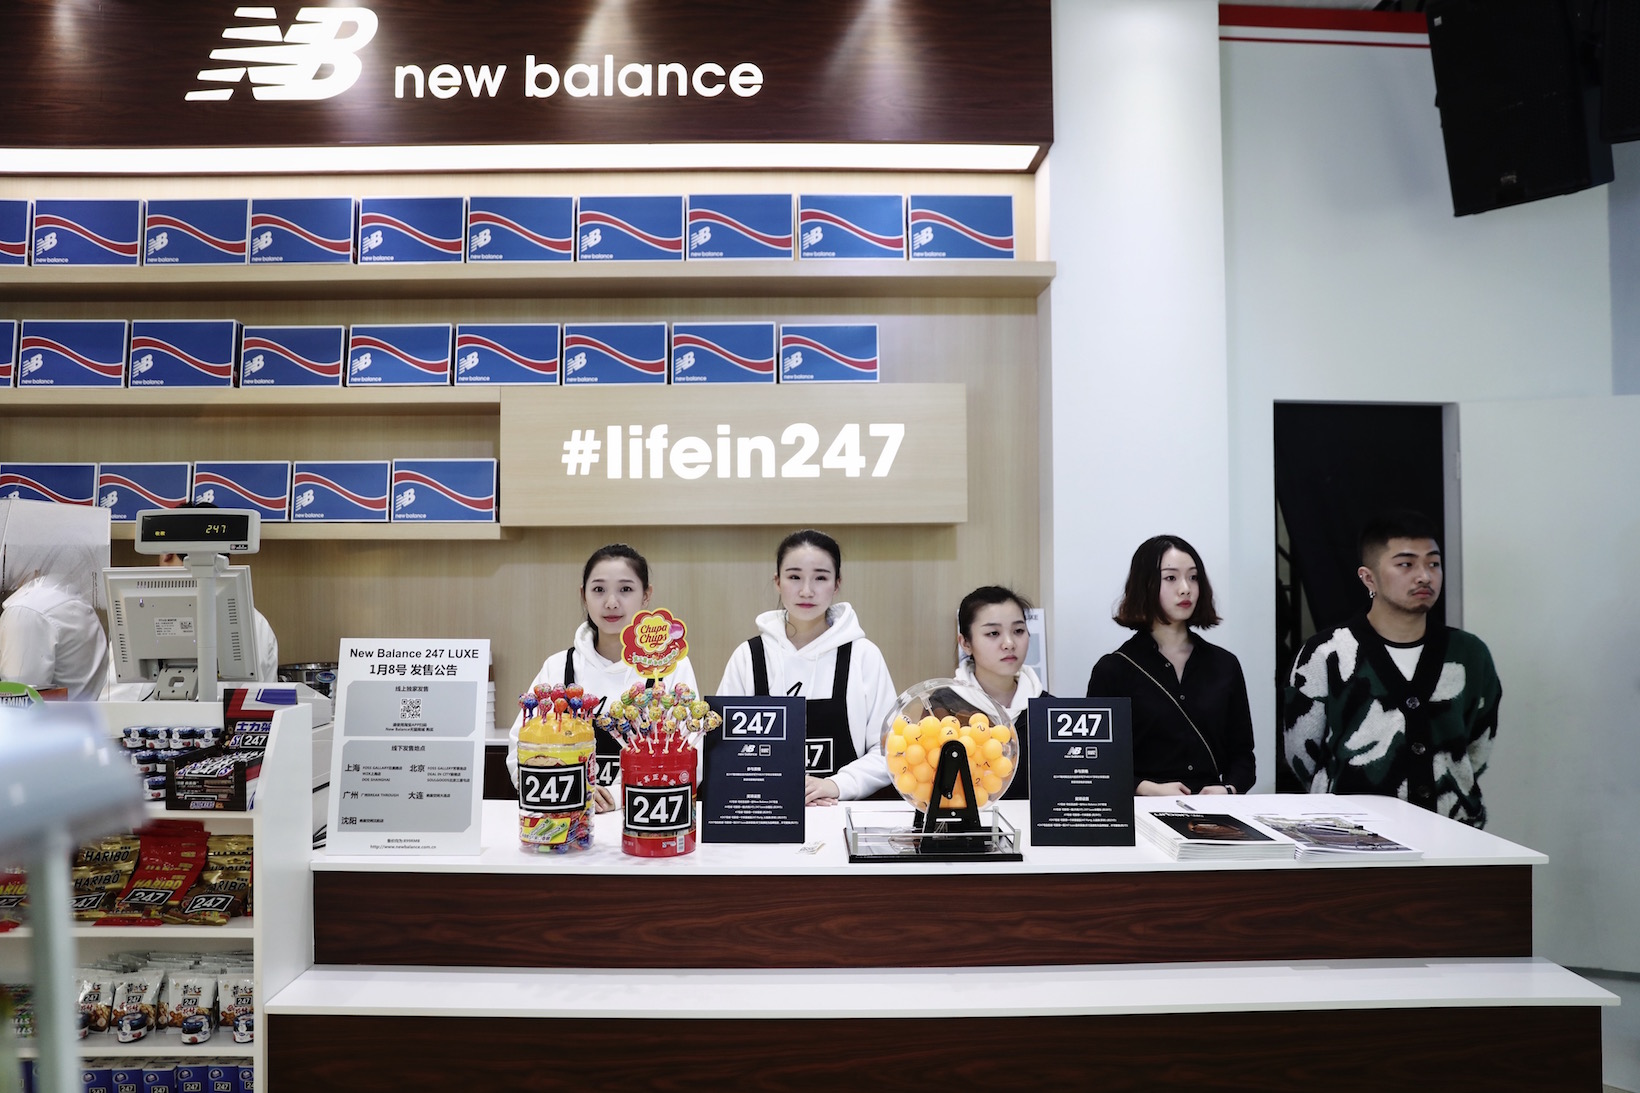 new balance 247 gold